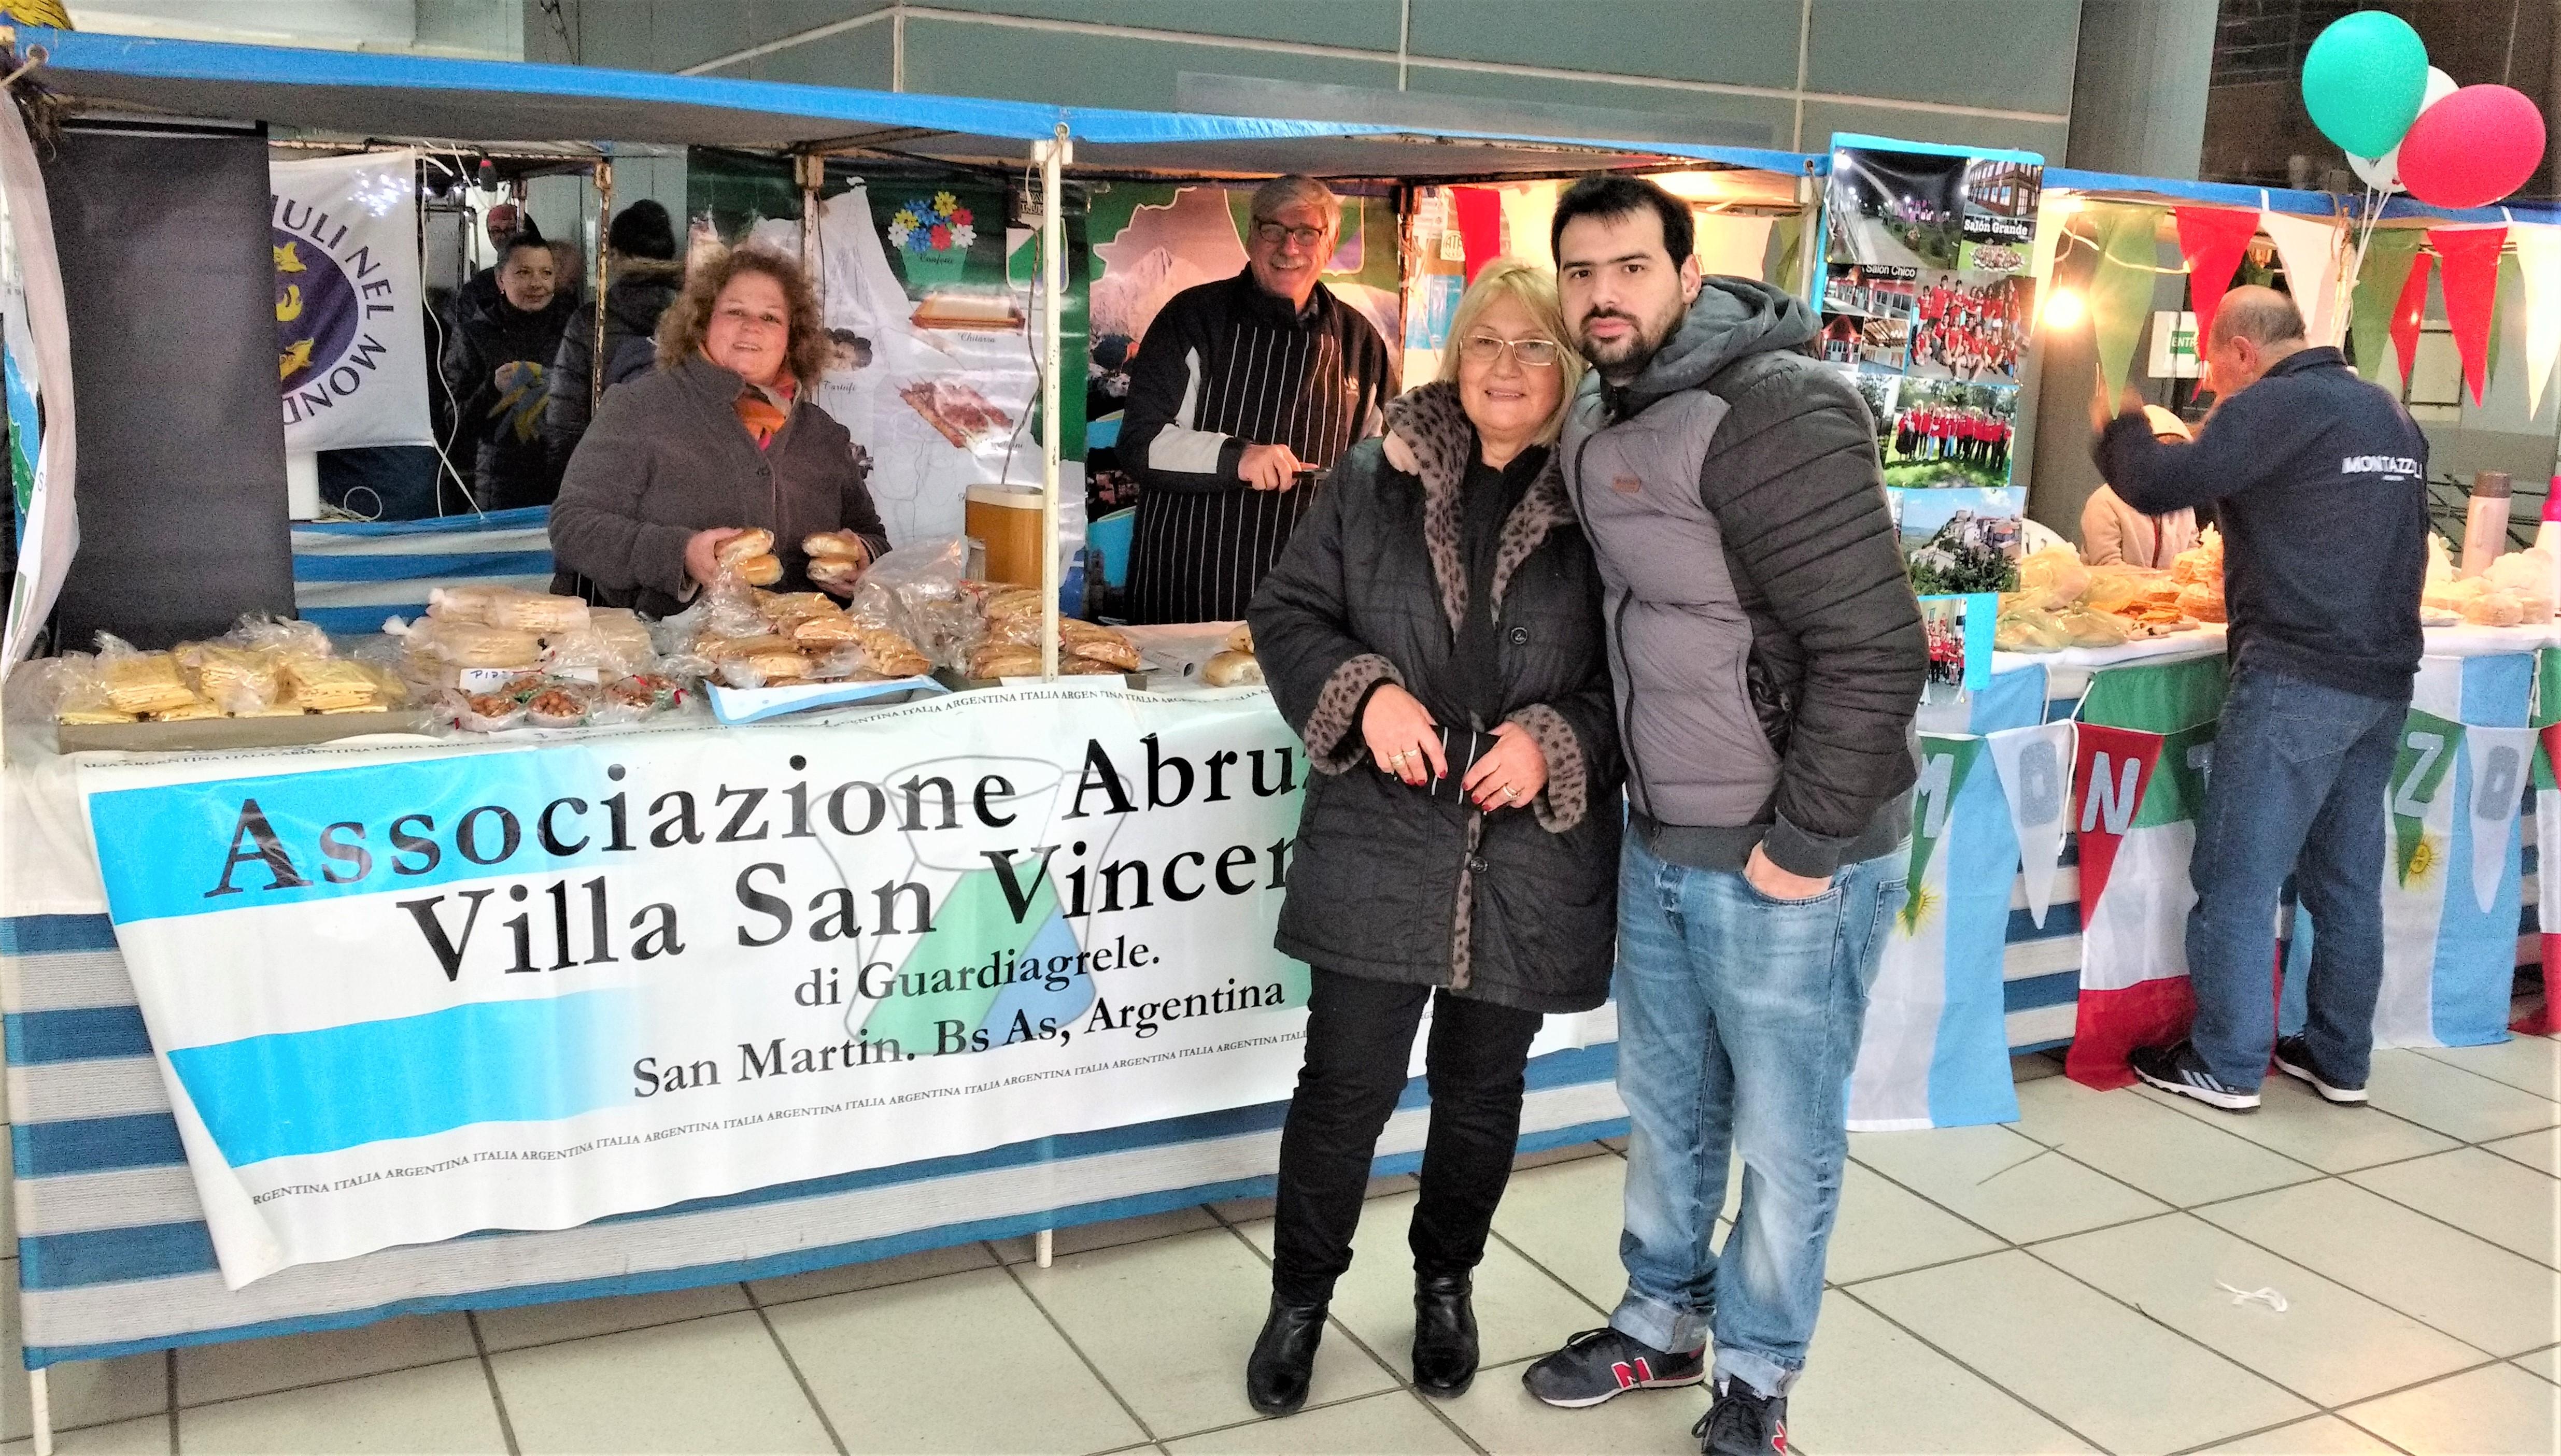 San Martin, Alicia Carosella e Federico Mandl